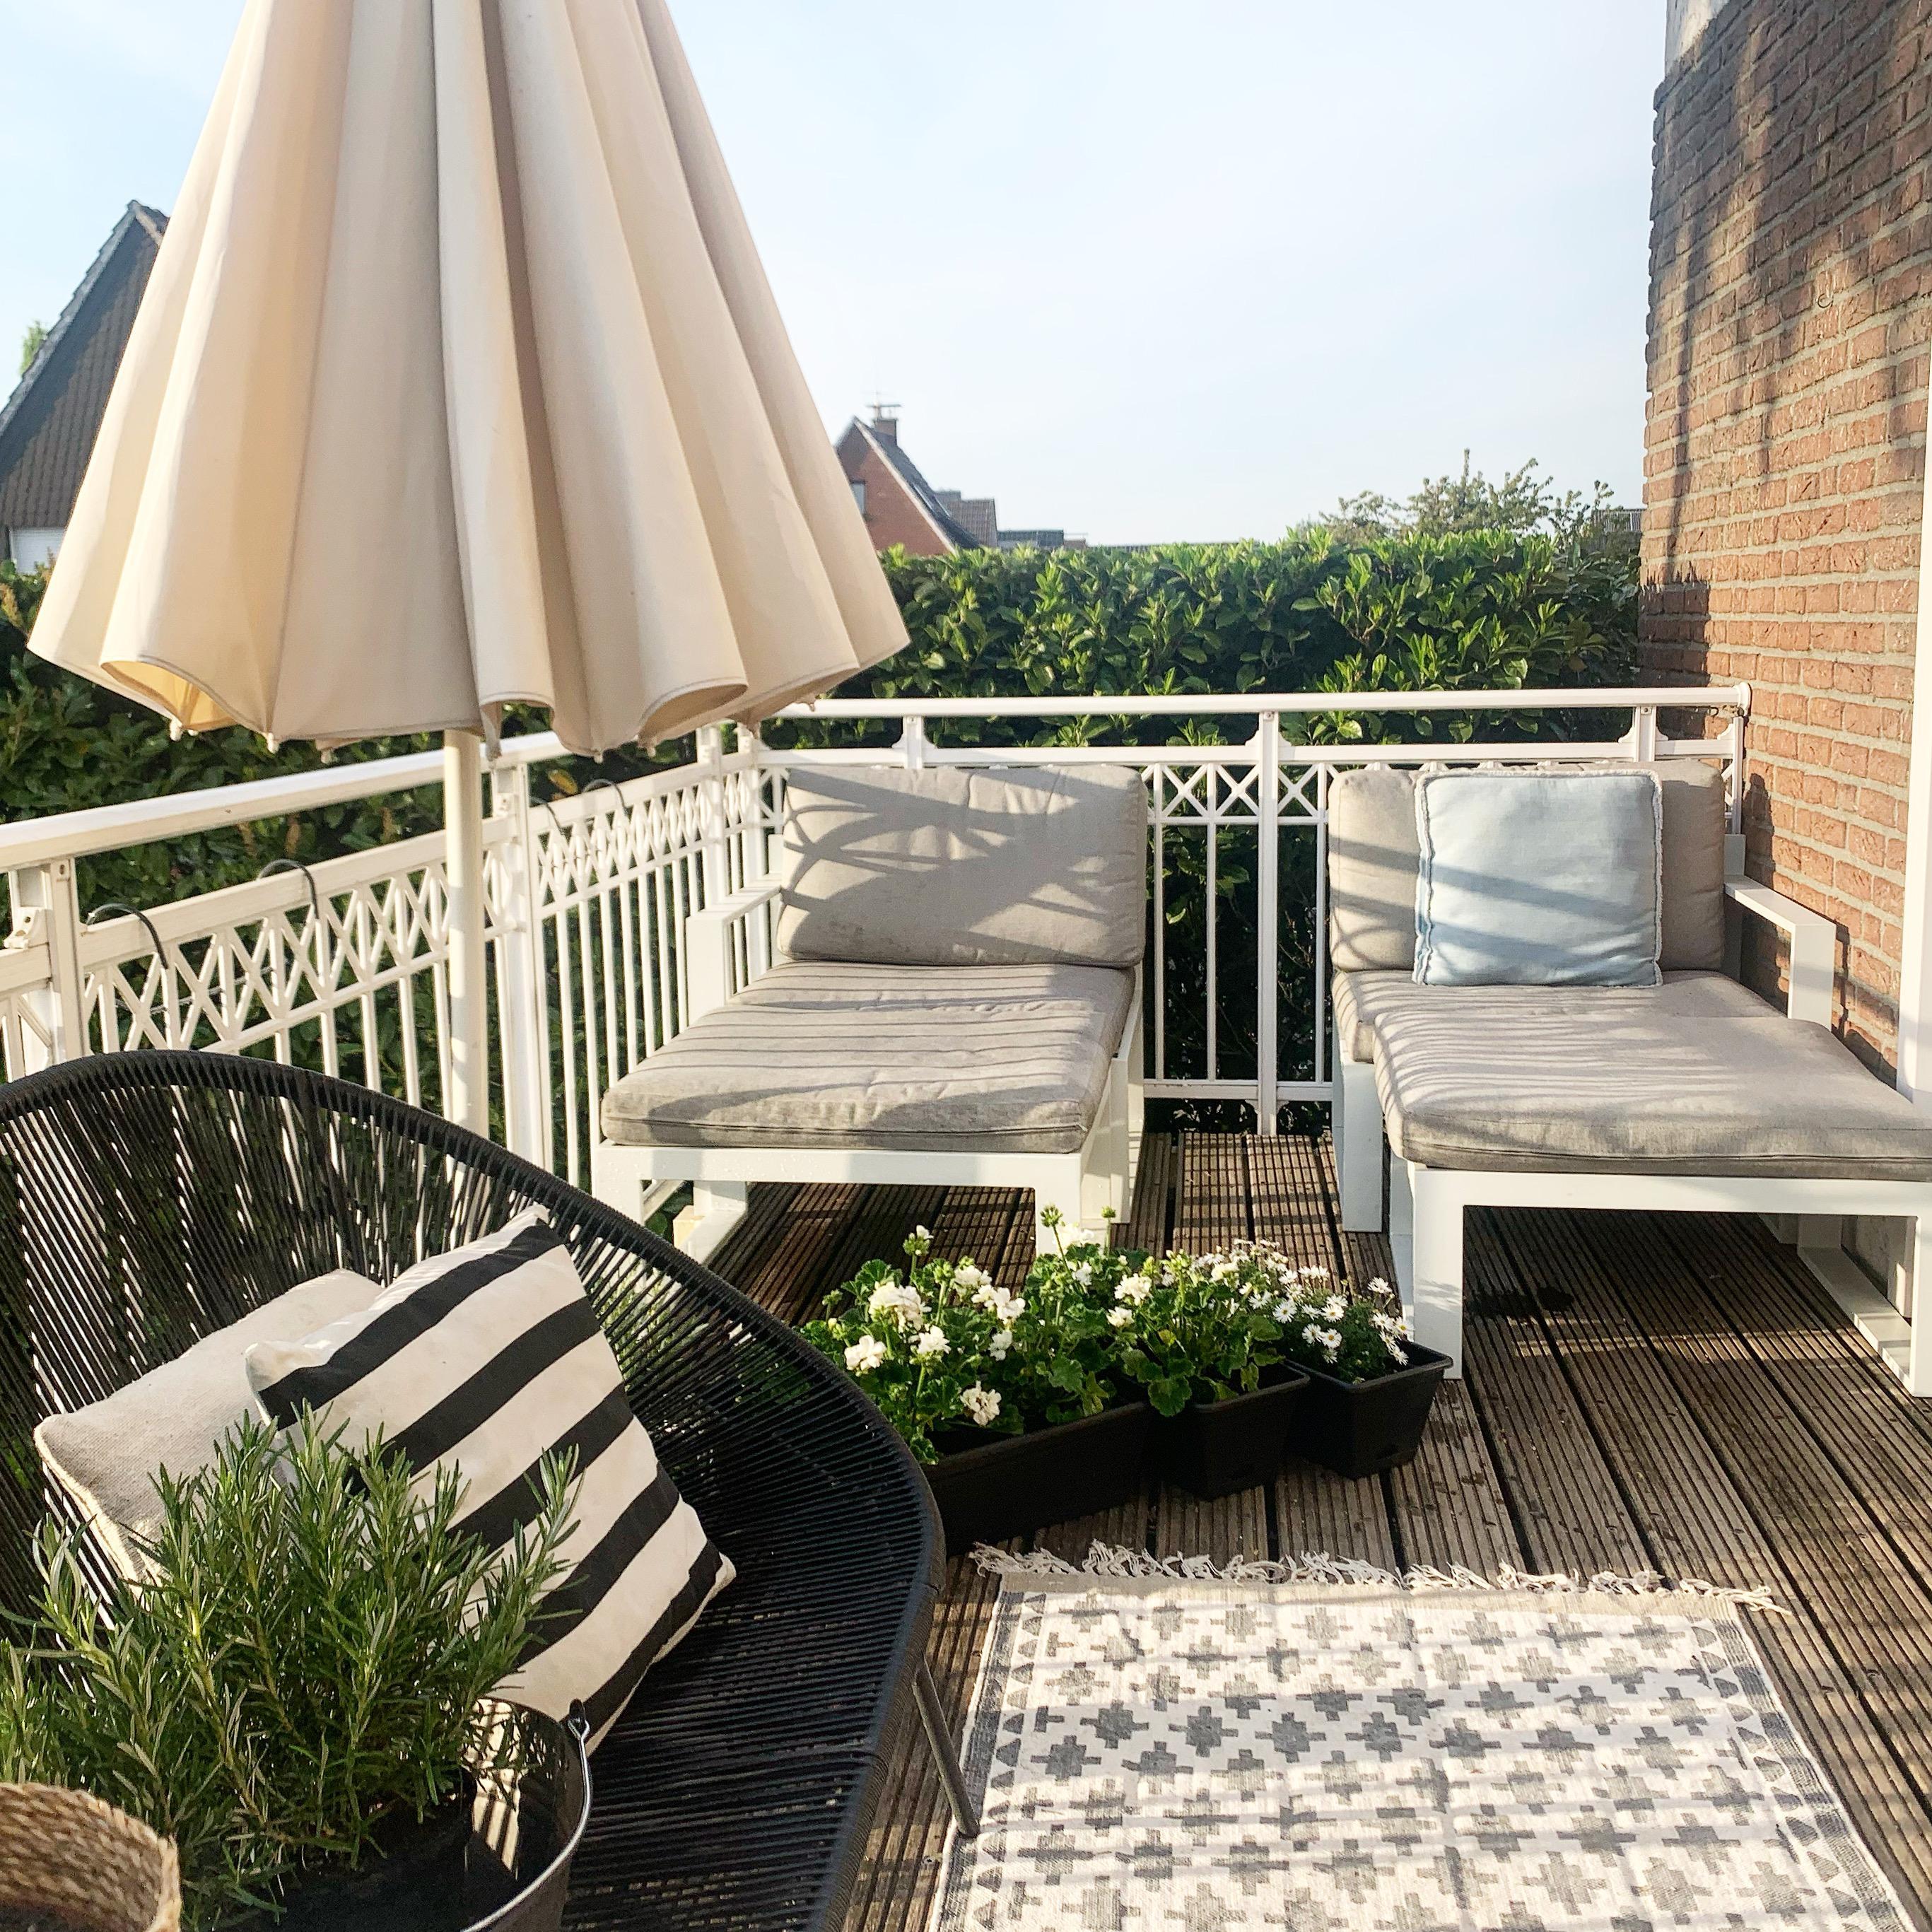 Balkon Deko So Gestaltest Du Deine Grune Oase